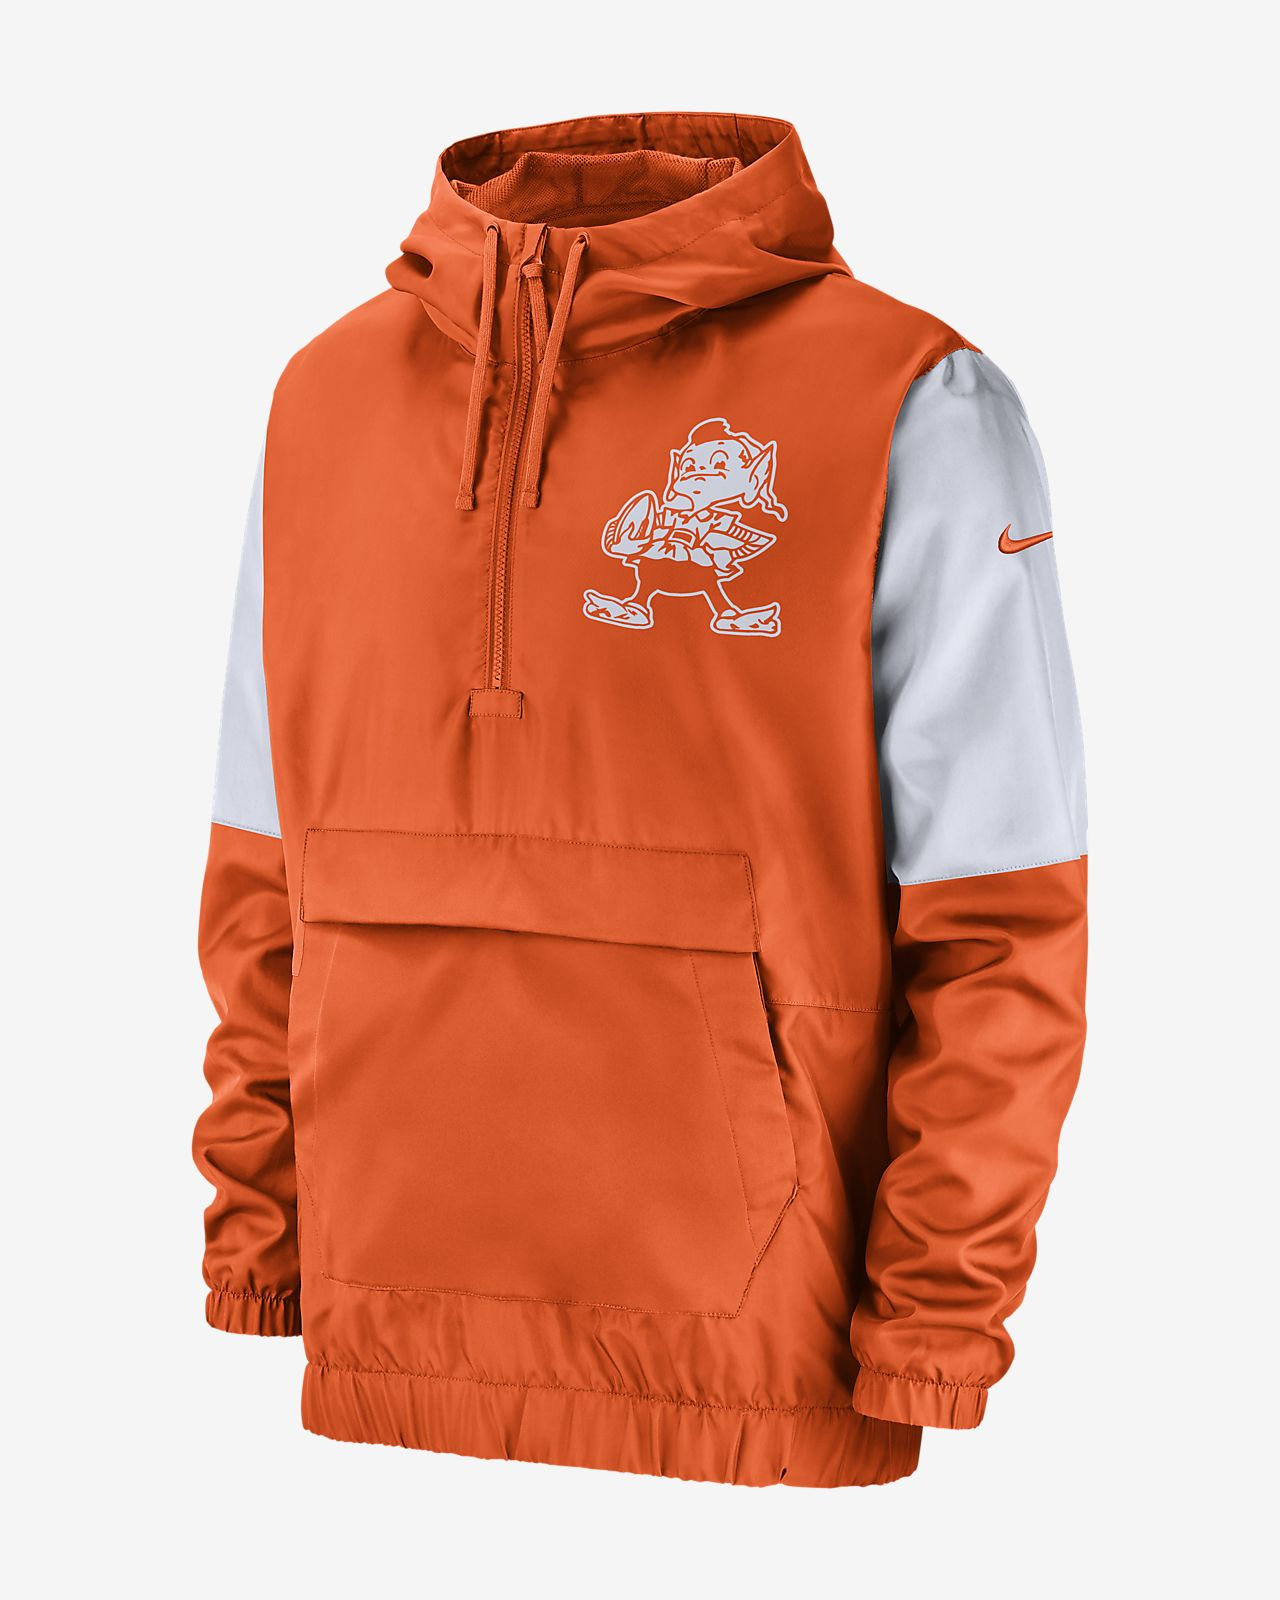 Nike Anorak (NFL Browns) Men's Jacket